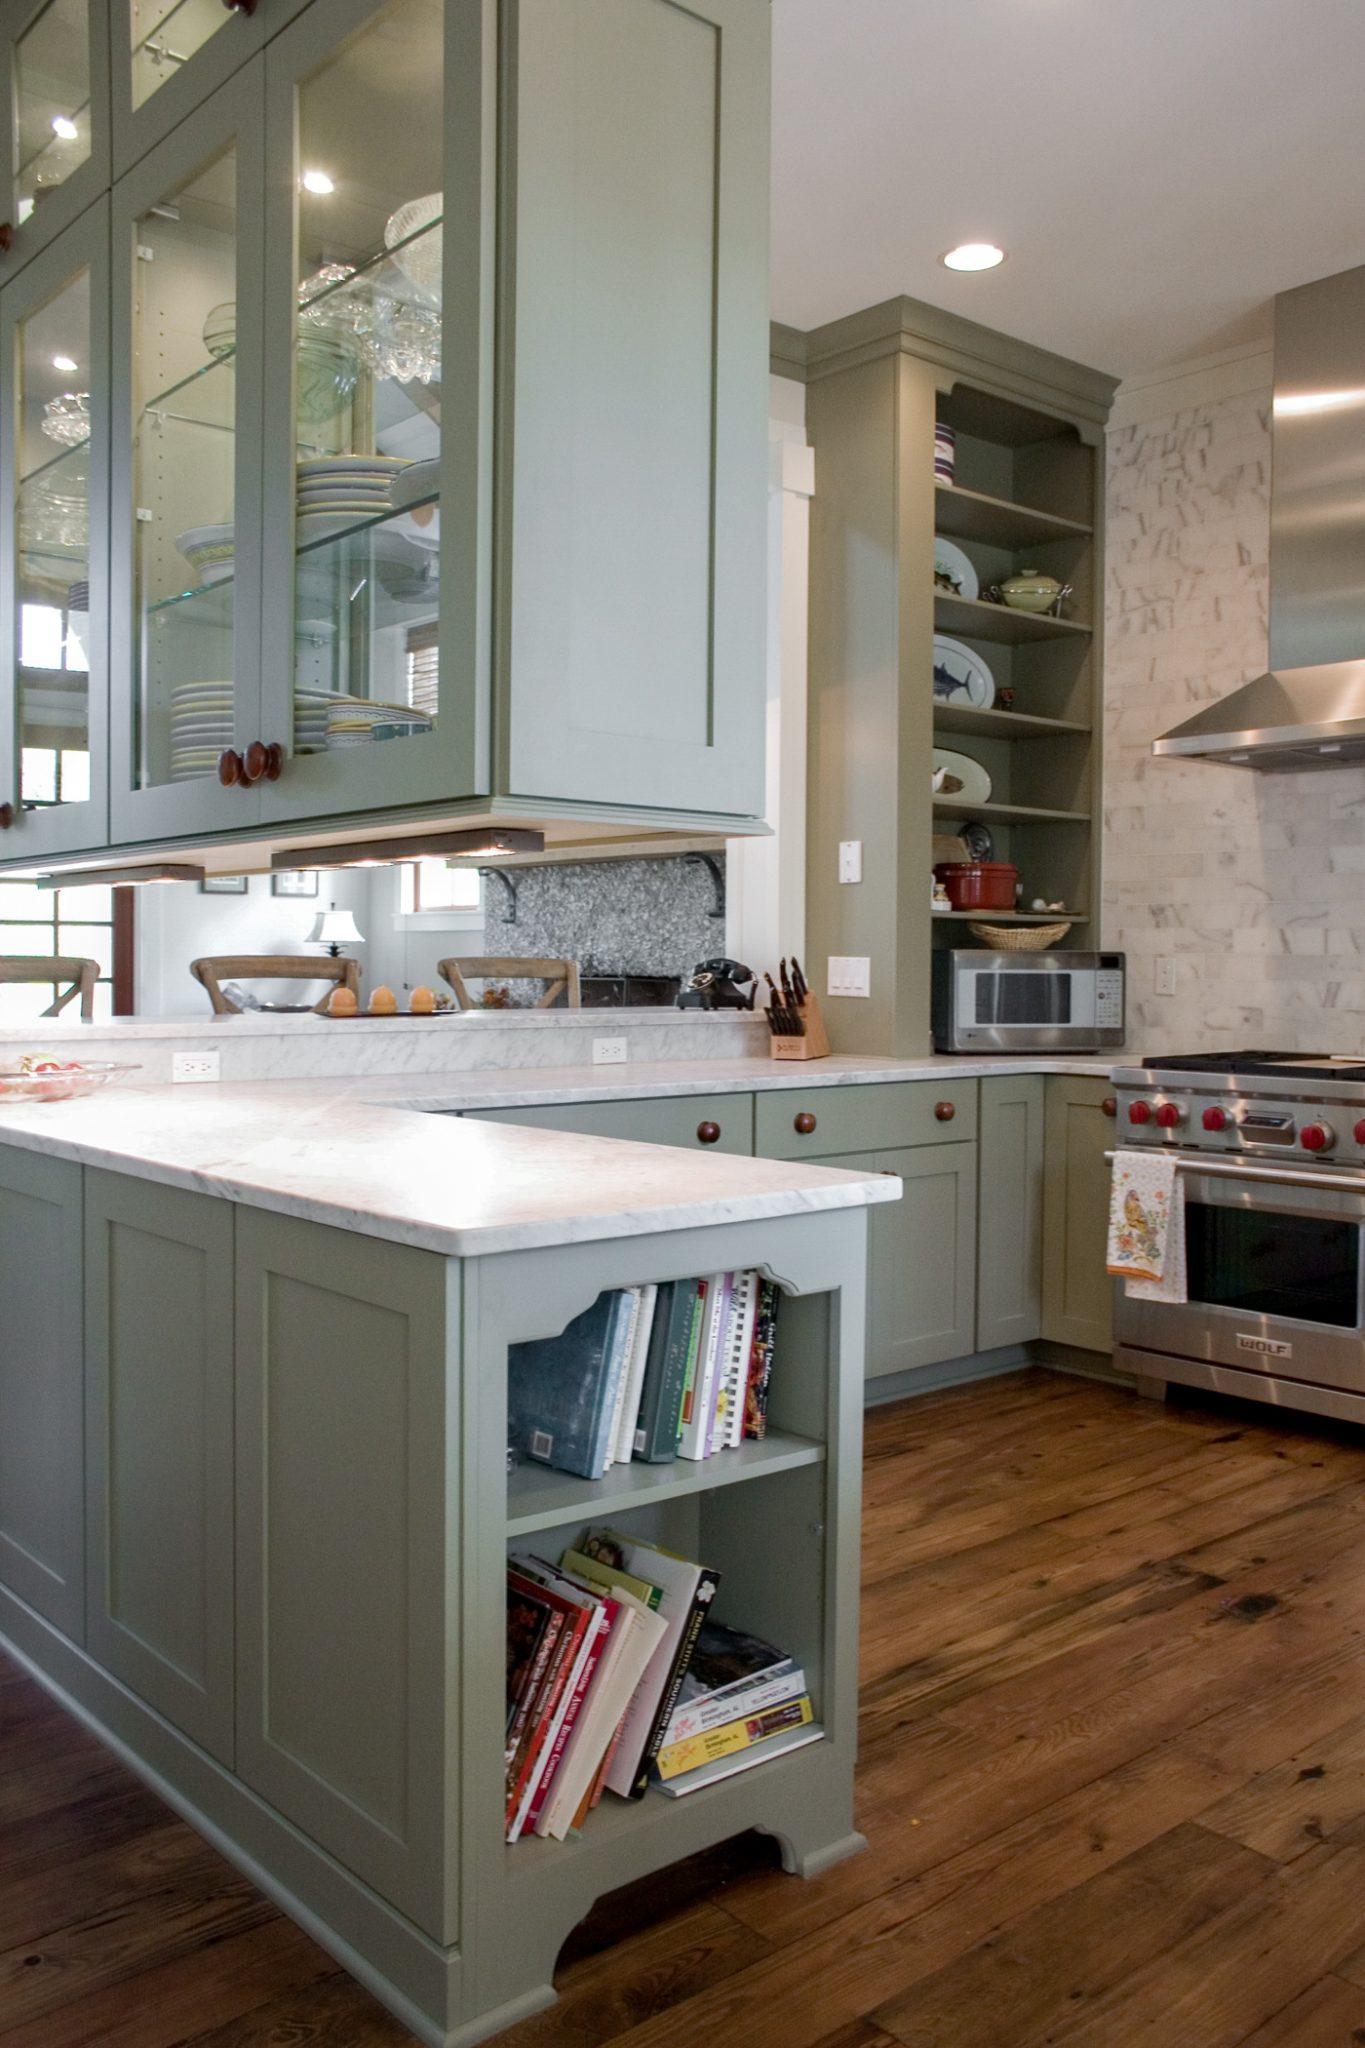 Beau Kitchens Etc Kitchen Design On 30a 7